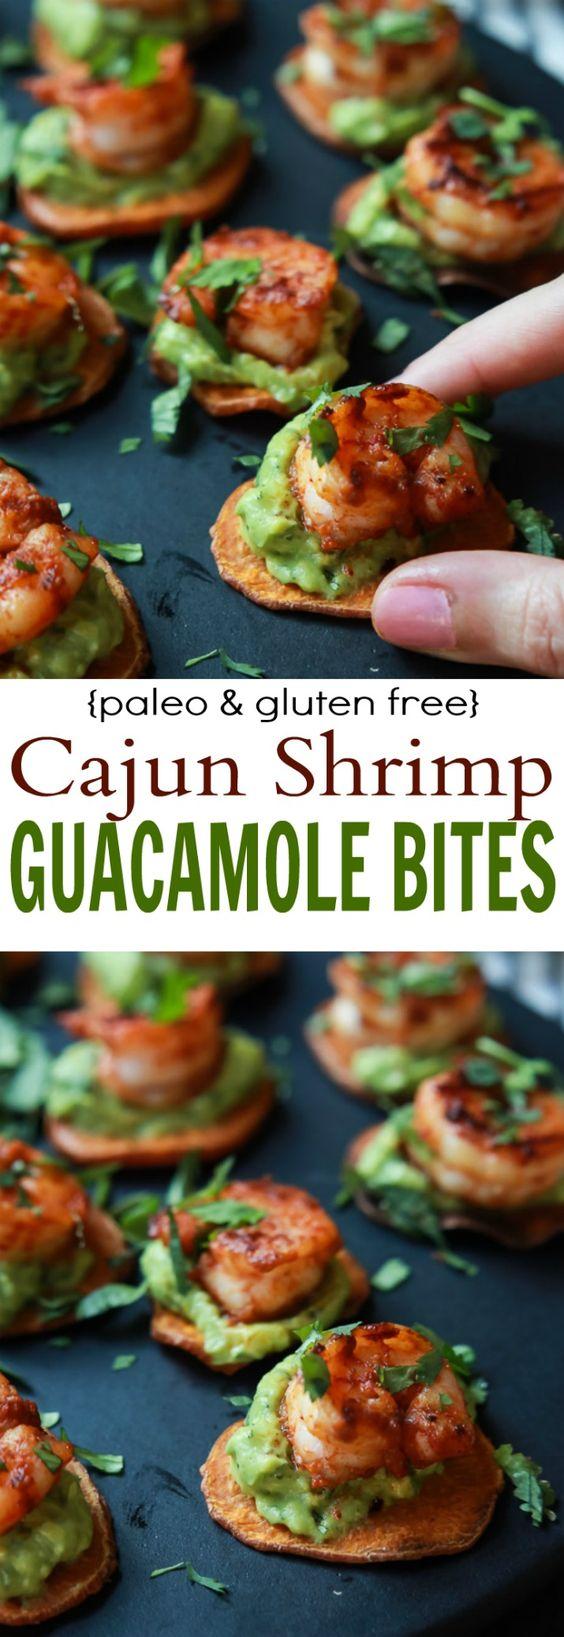 cajun shrimp guacamole bites - paleo, gluten free